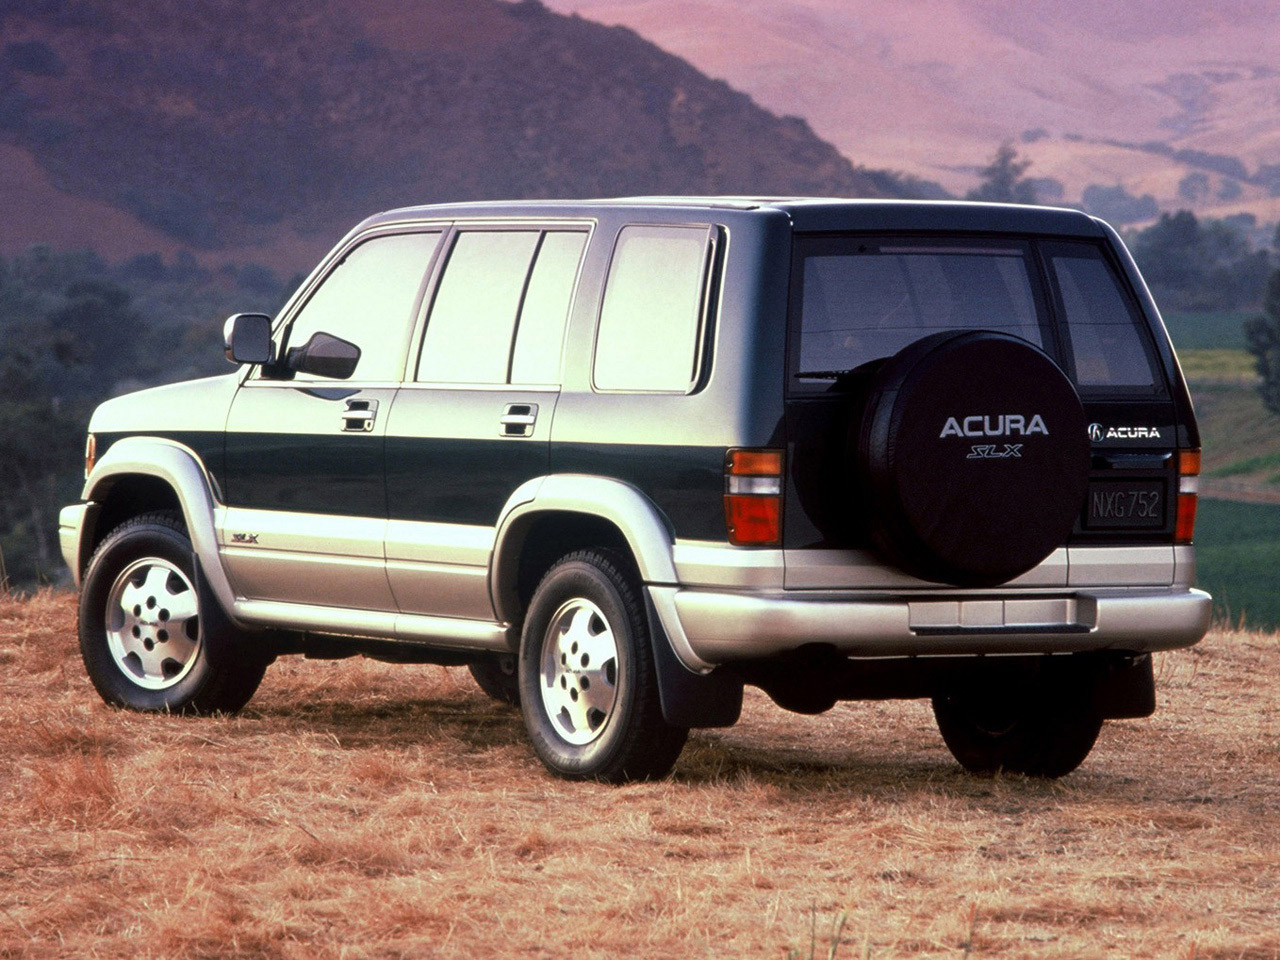 Car Photo Gallery » Acura SLX 1996-1998